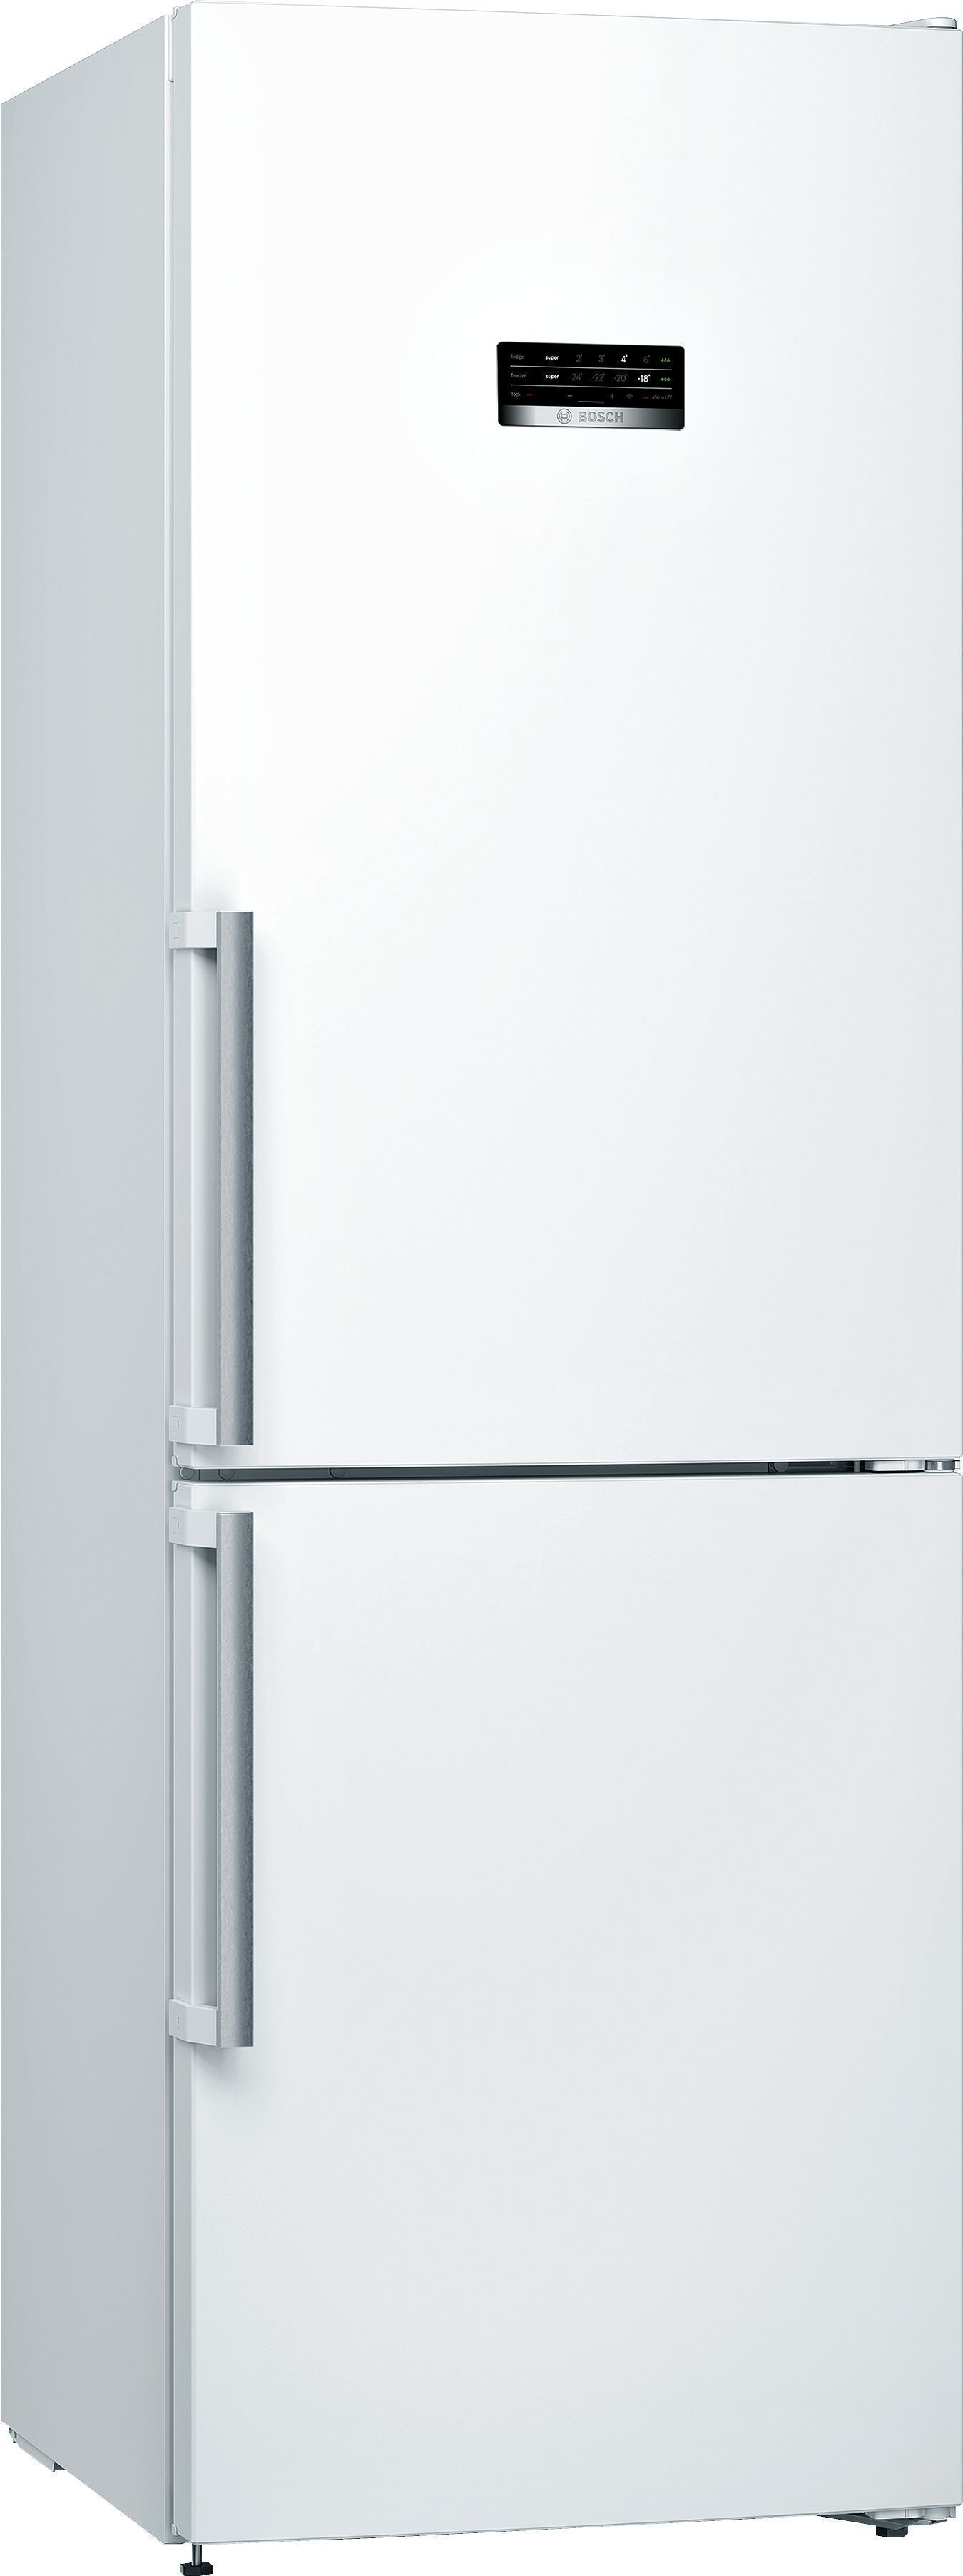 Frigorifico Bosch KGN36XWDP Combi 186 Nf A+++